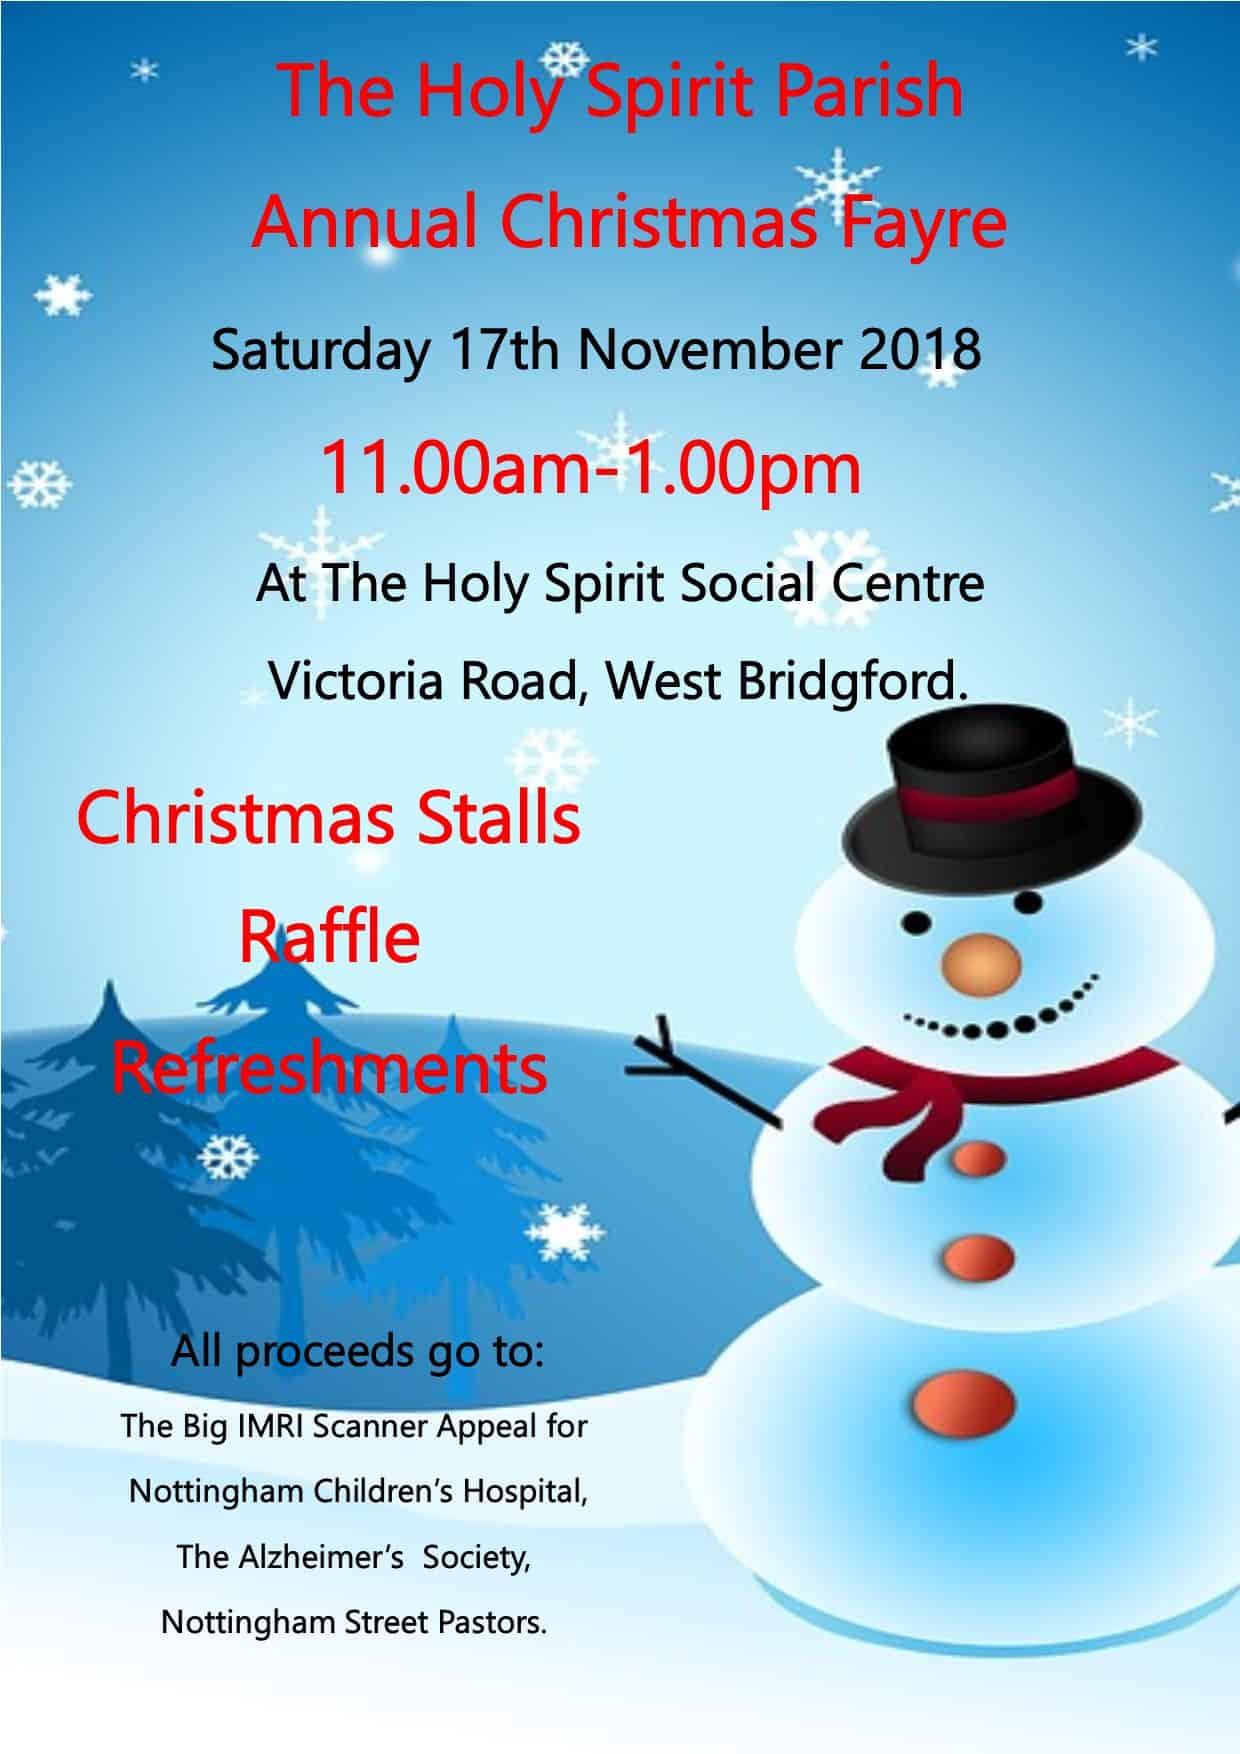 Christmas Fayre Poster 2018